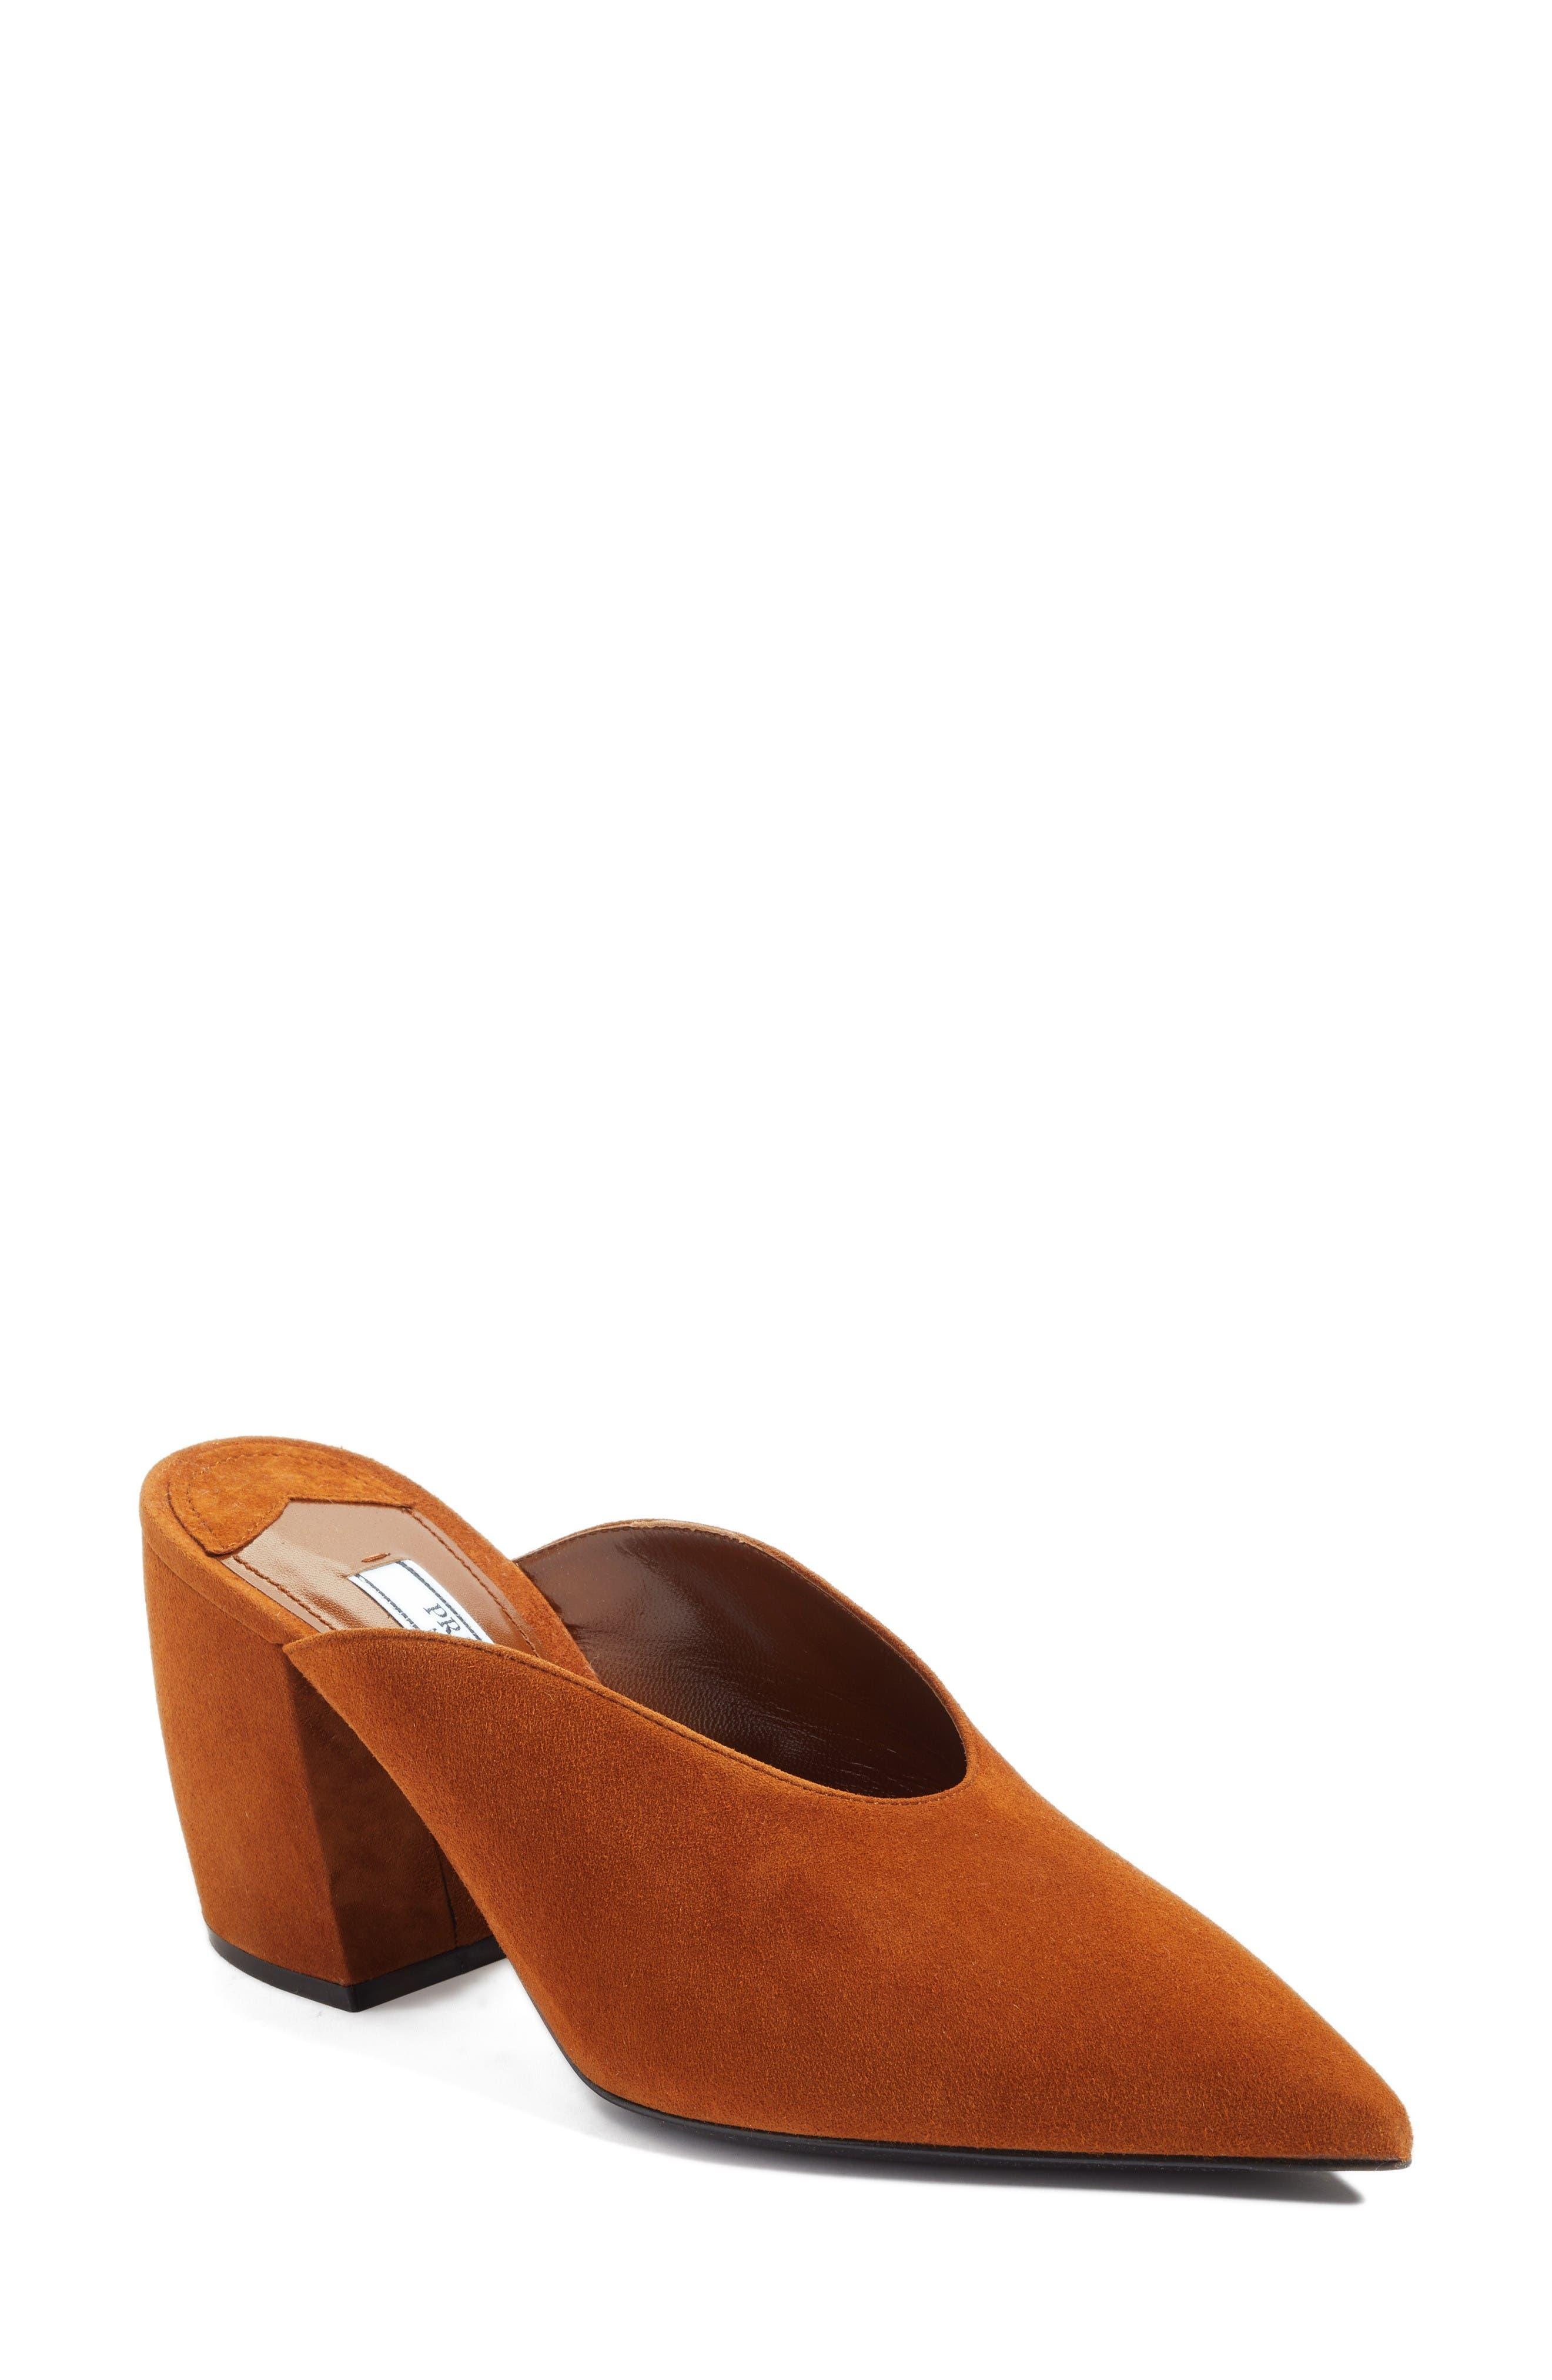 Alternate Image 1 Selected - Prada Slant Heel Mule (Women)